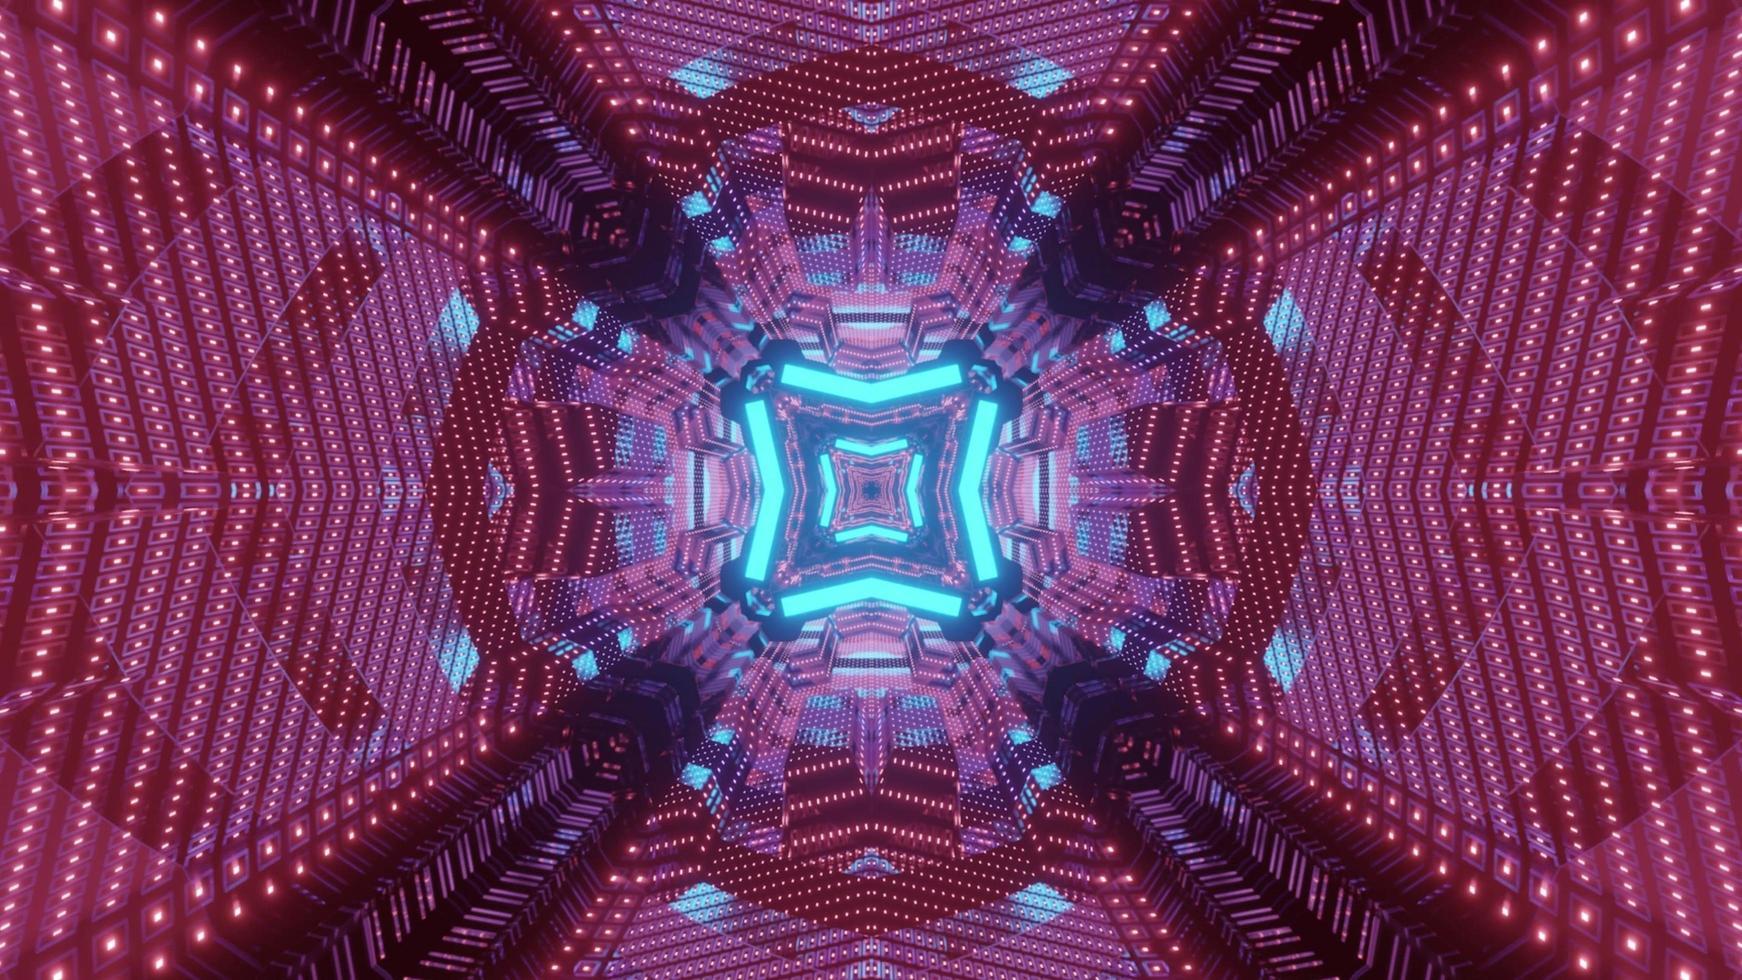 Futuristic tunnel with geometric design in neon lights 3d illustration photo